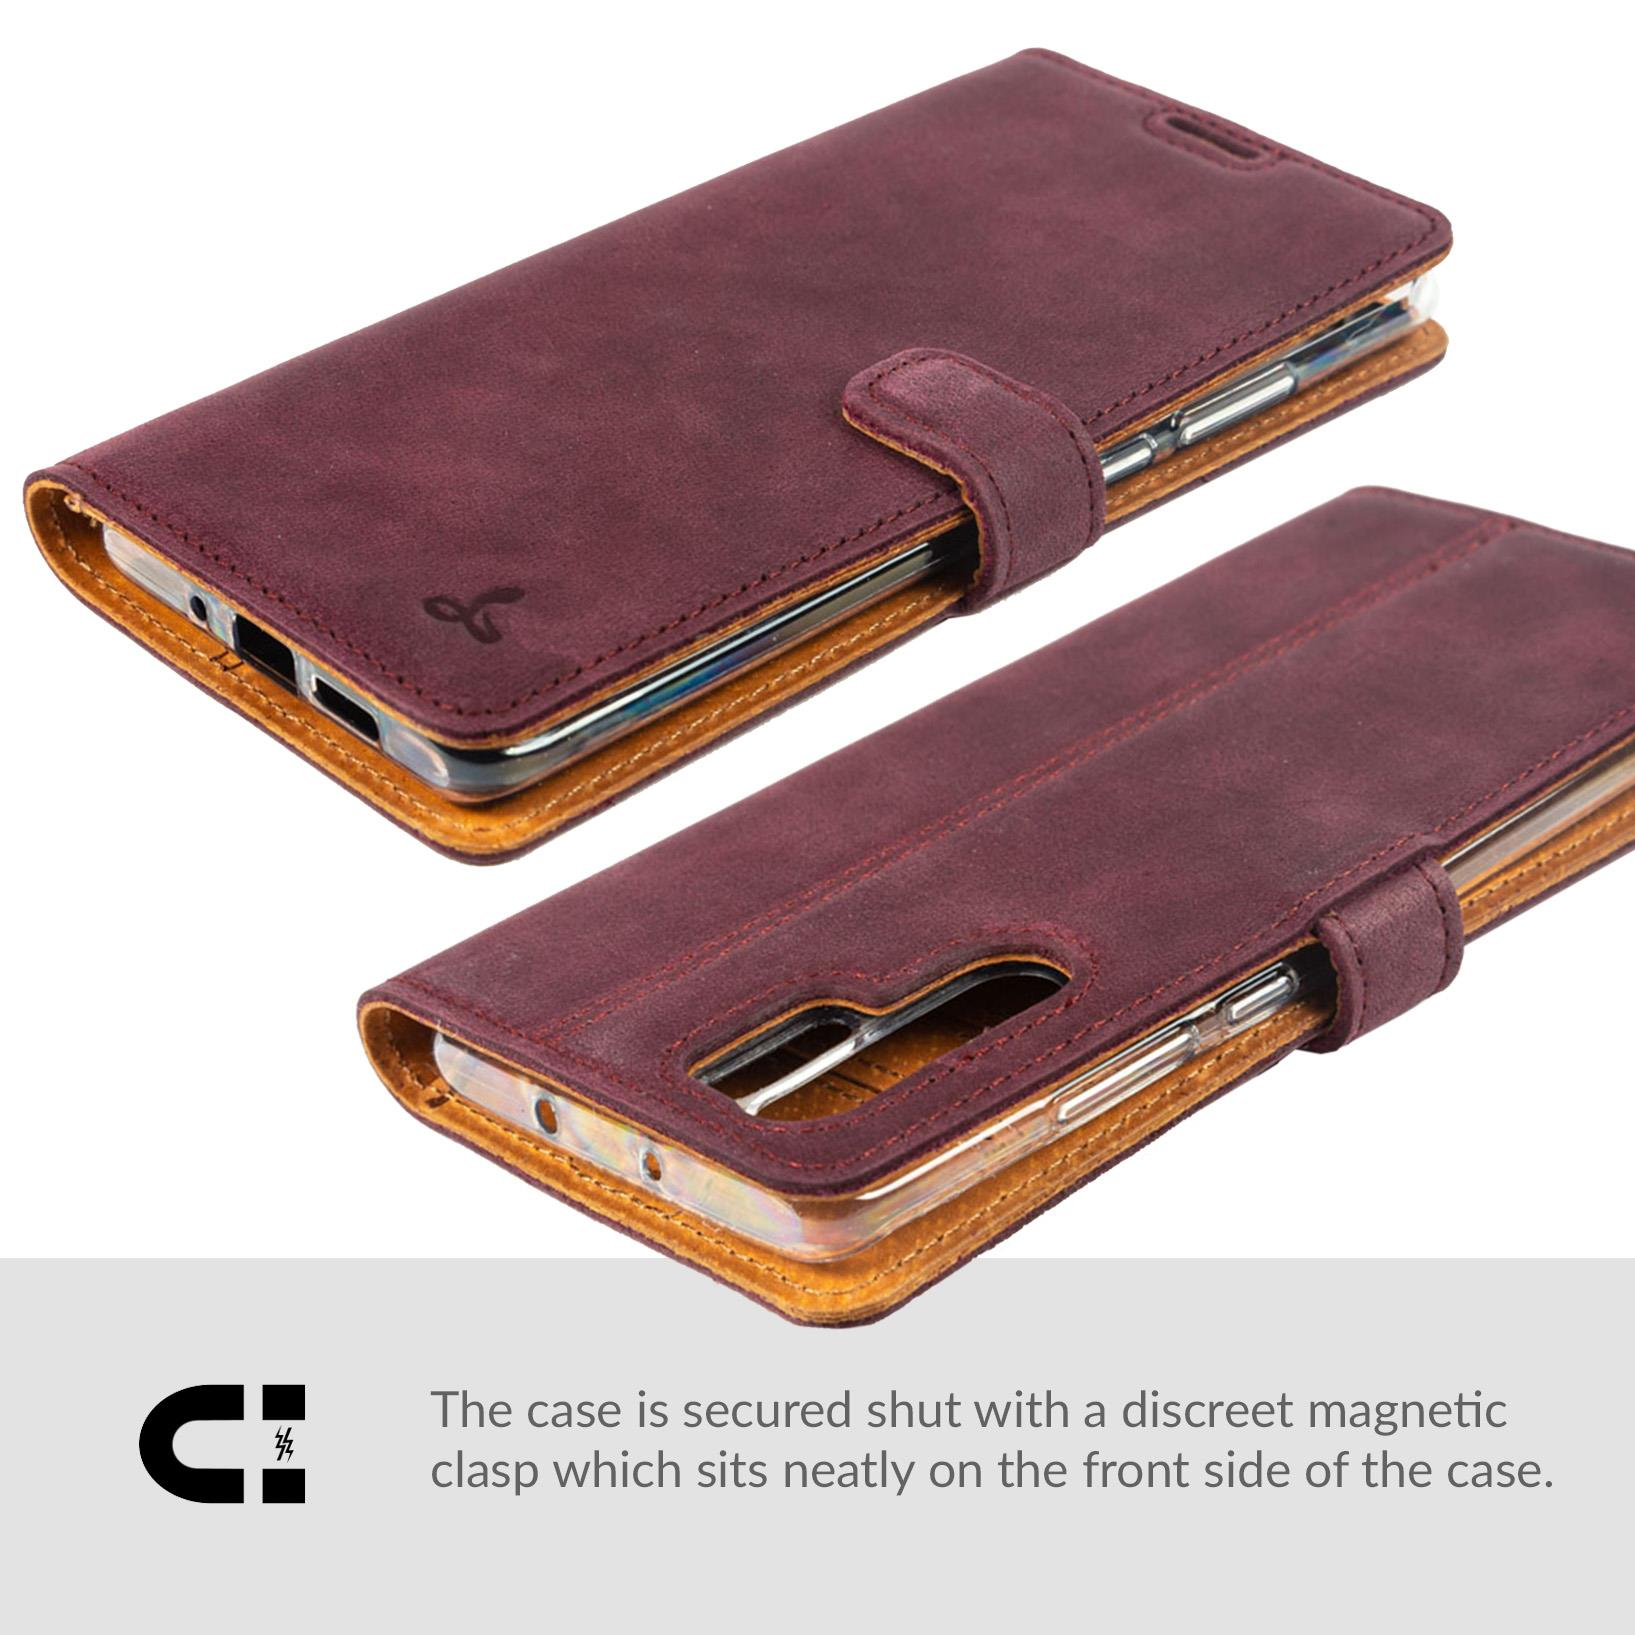 Snakehive-Huawei-P30-Pro-Premium-Genuine-Leather-Wallet-Case-w-Card-Slots thumbnail 16